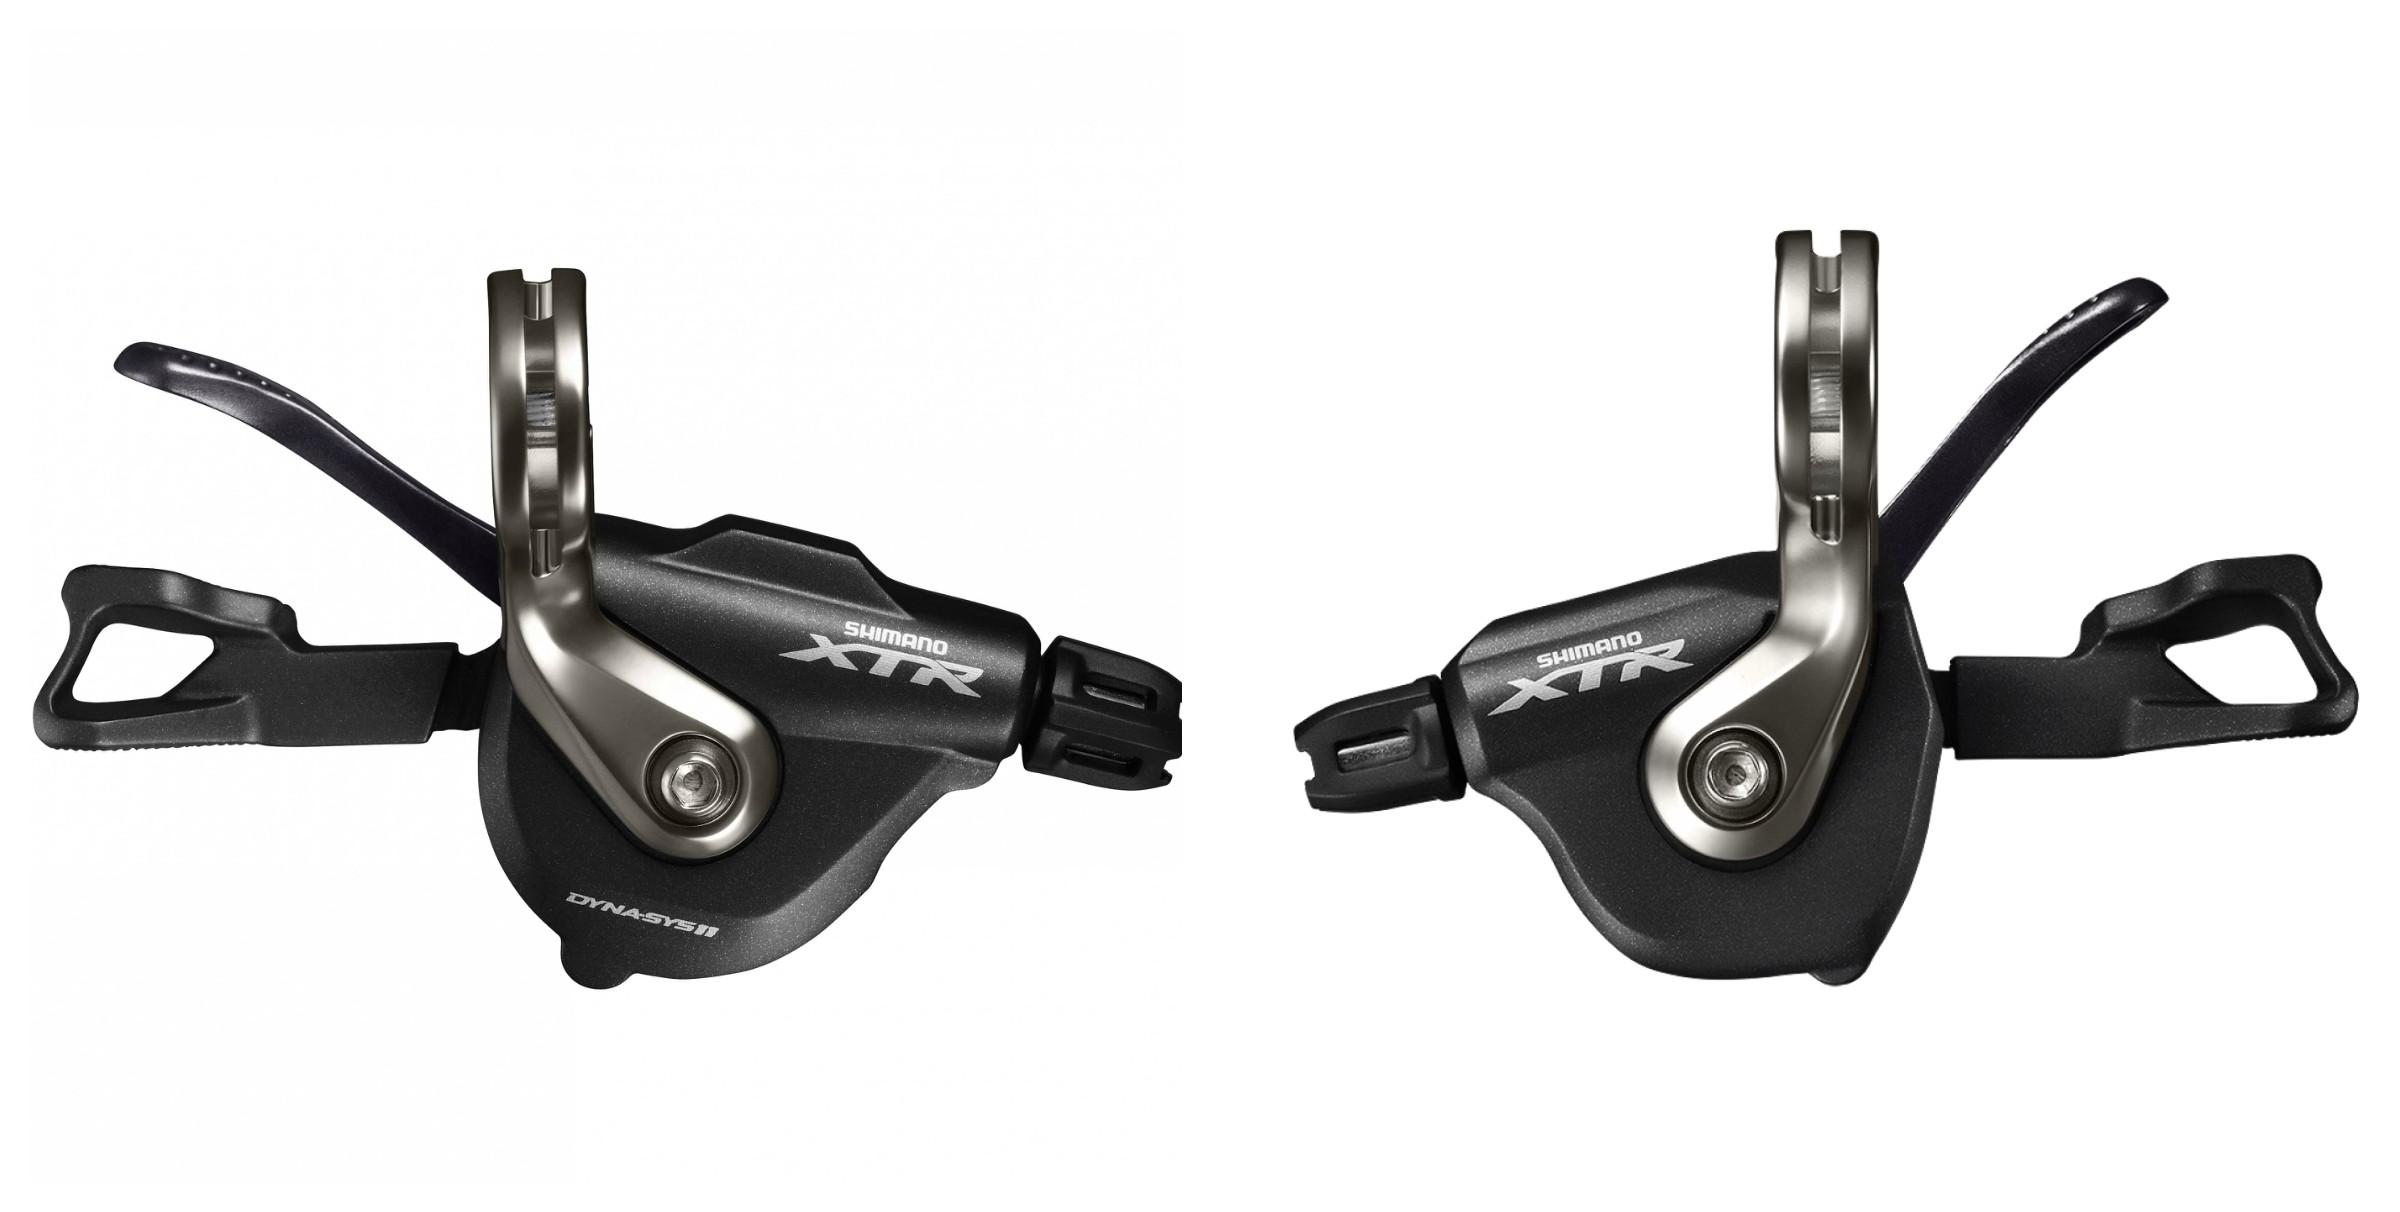 Shimano XTR SL-M9000 shifters